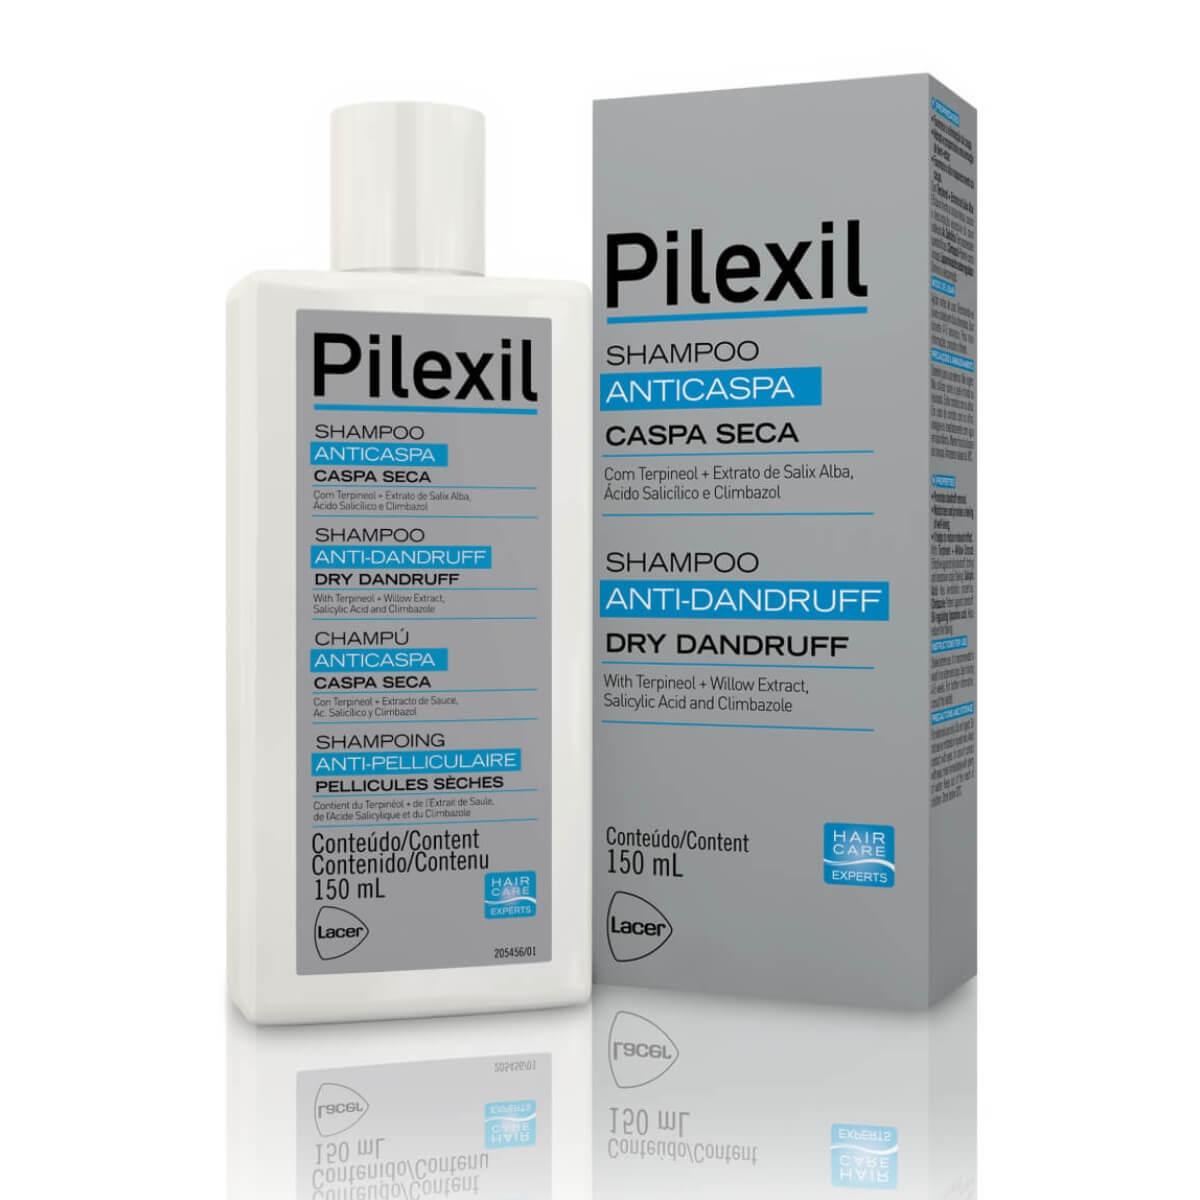 Shampoo Anticaspa Pilexil Caspa Seca 150ml